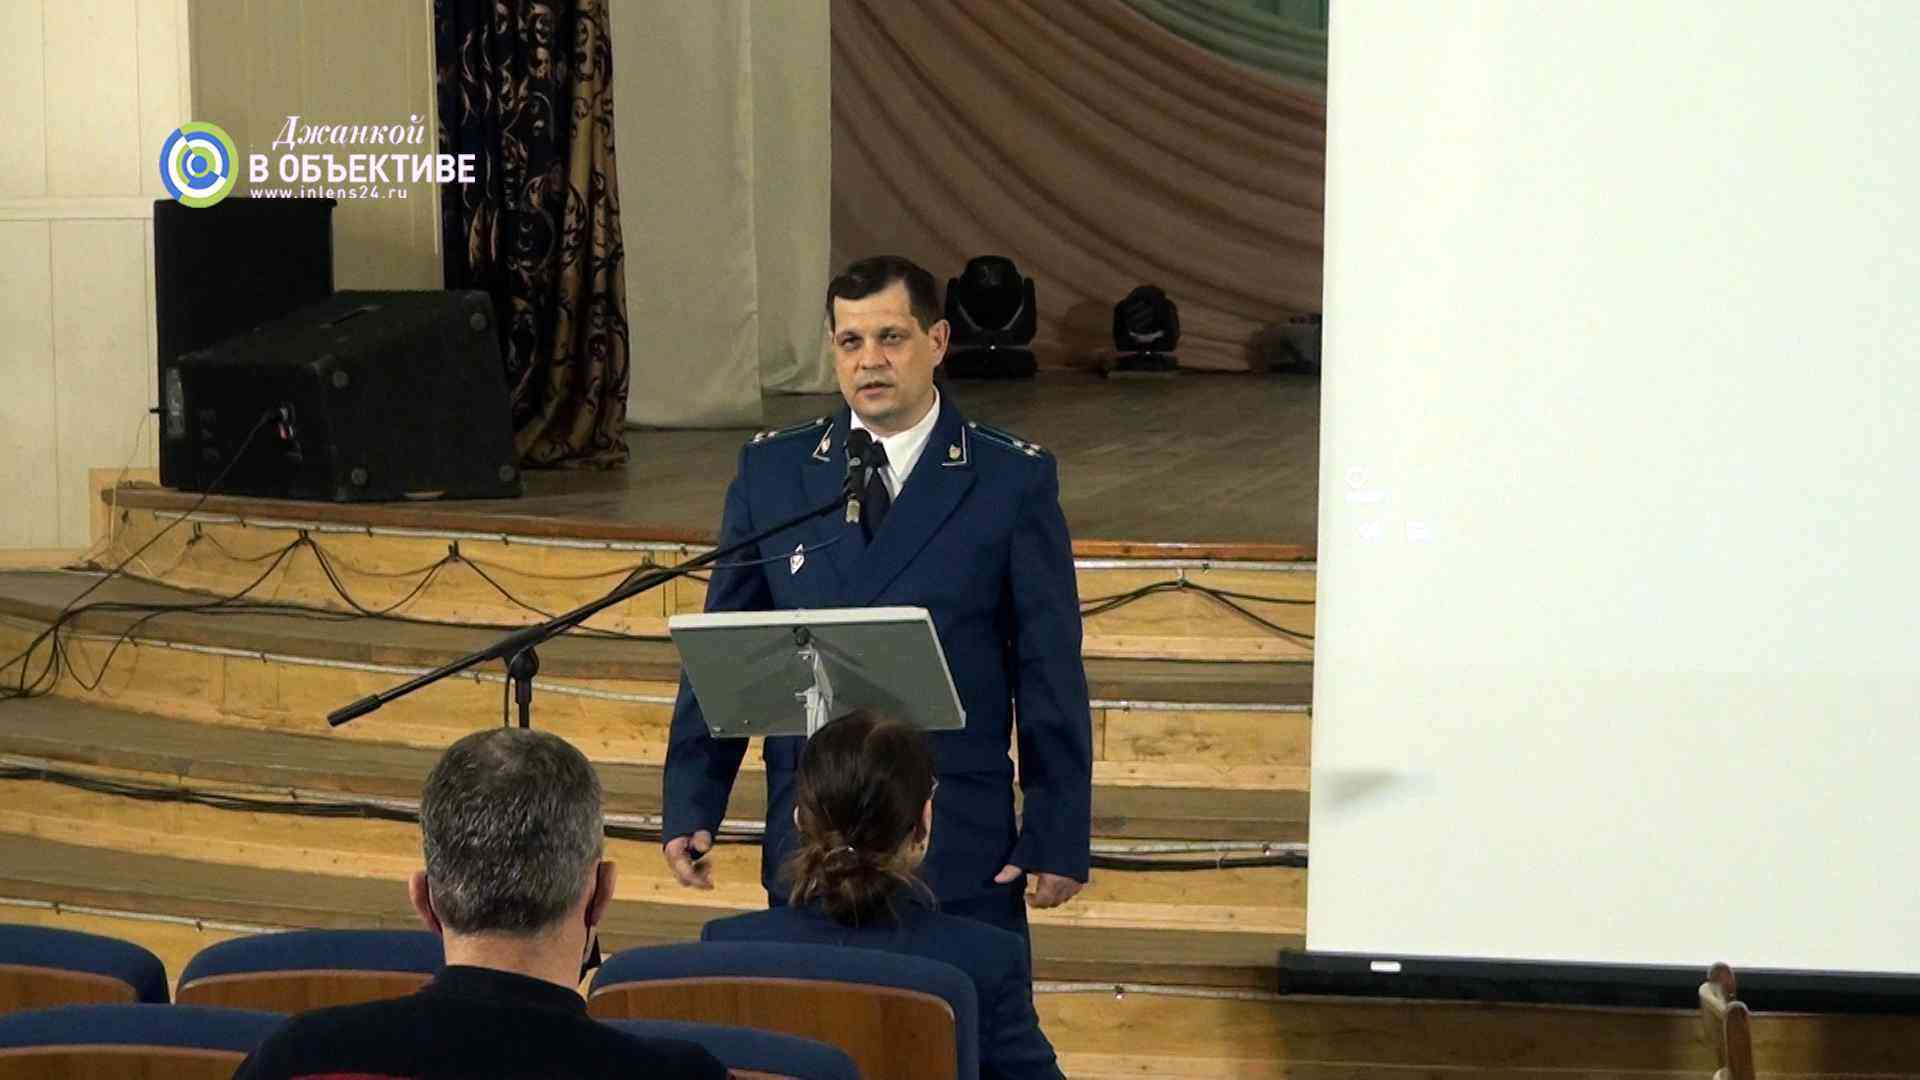 конференция к 300 летию прокуратуры. Джанкойский прокурор